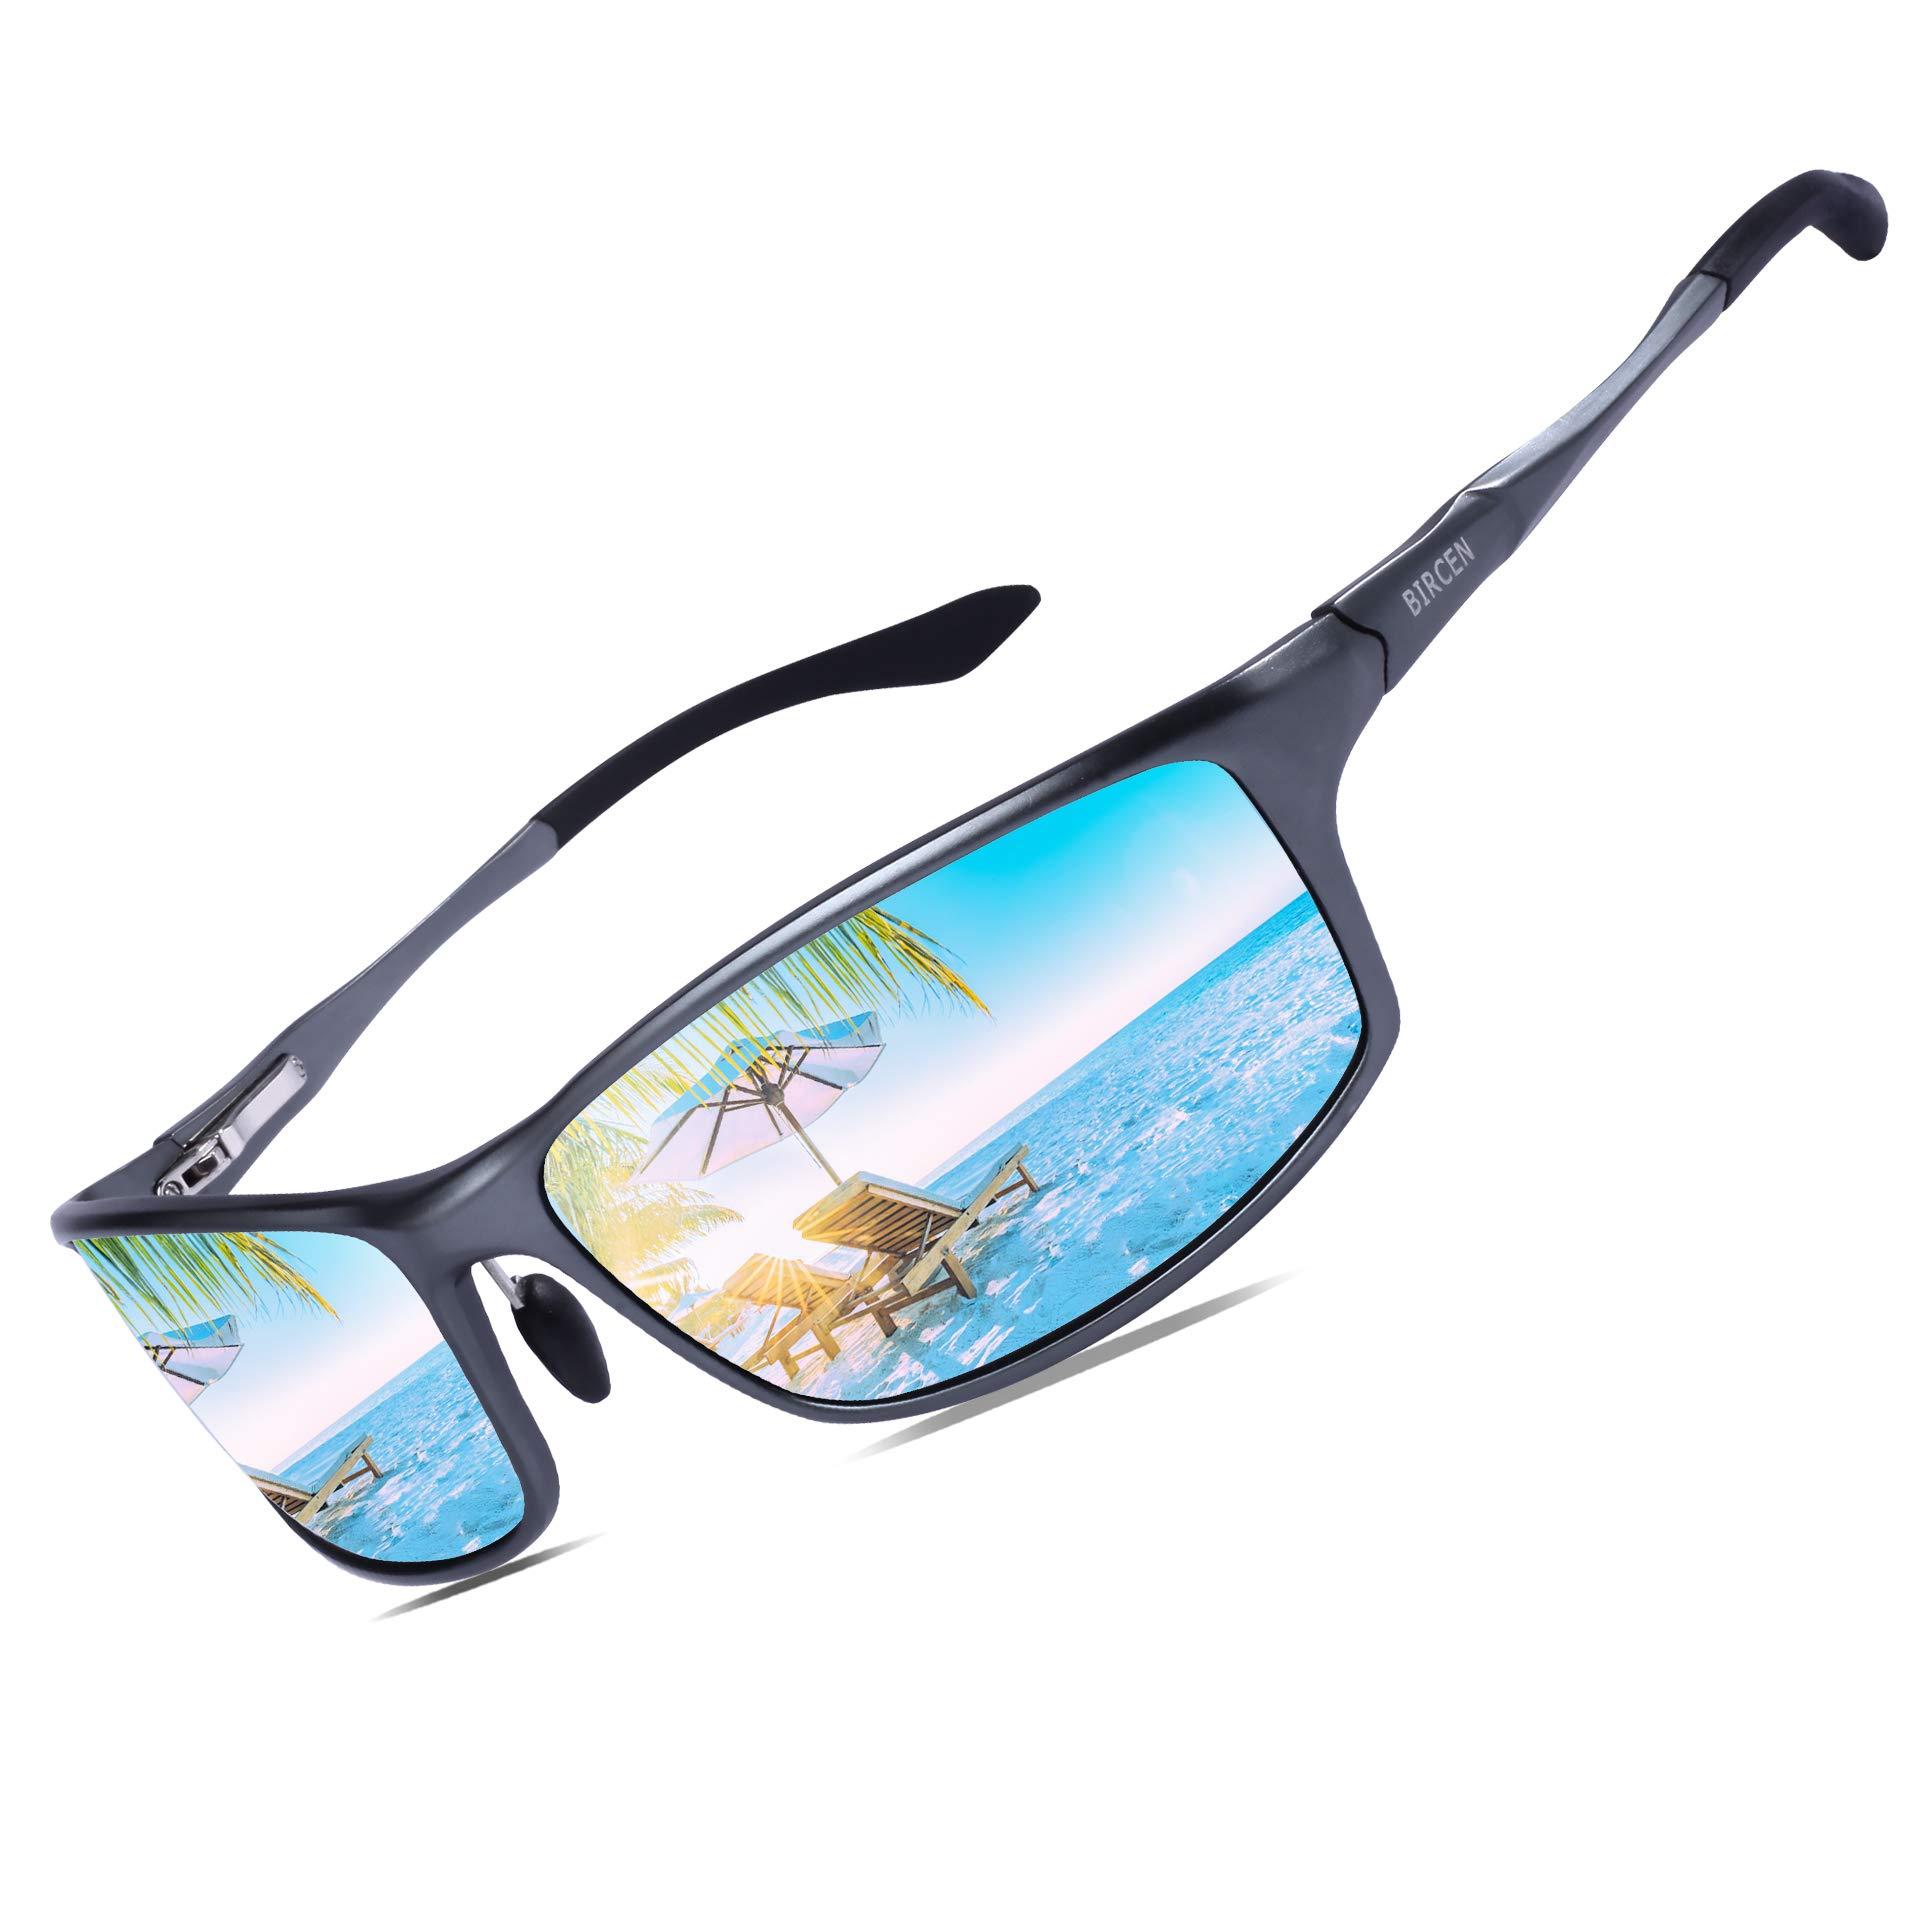 Bircen Polarized Sunglasses for Men Women UV Protection Driving Golf Fishing Sports Sunglasses by Bircen